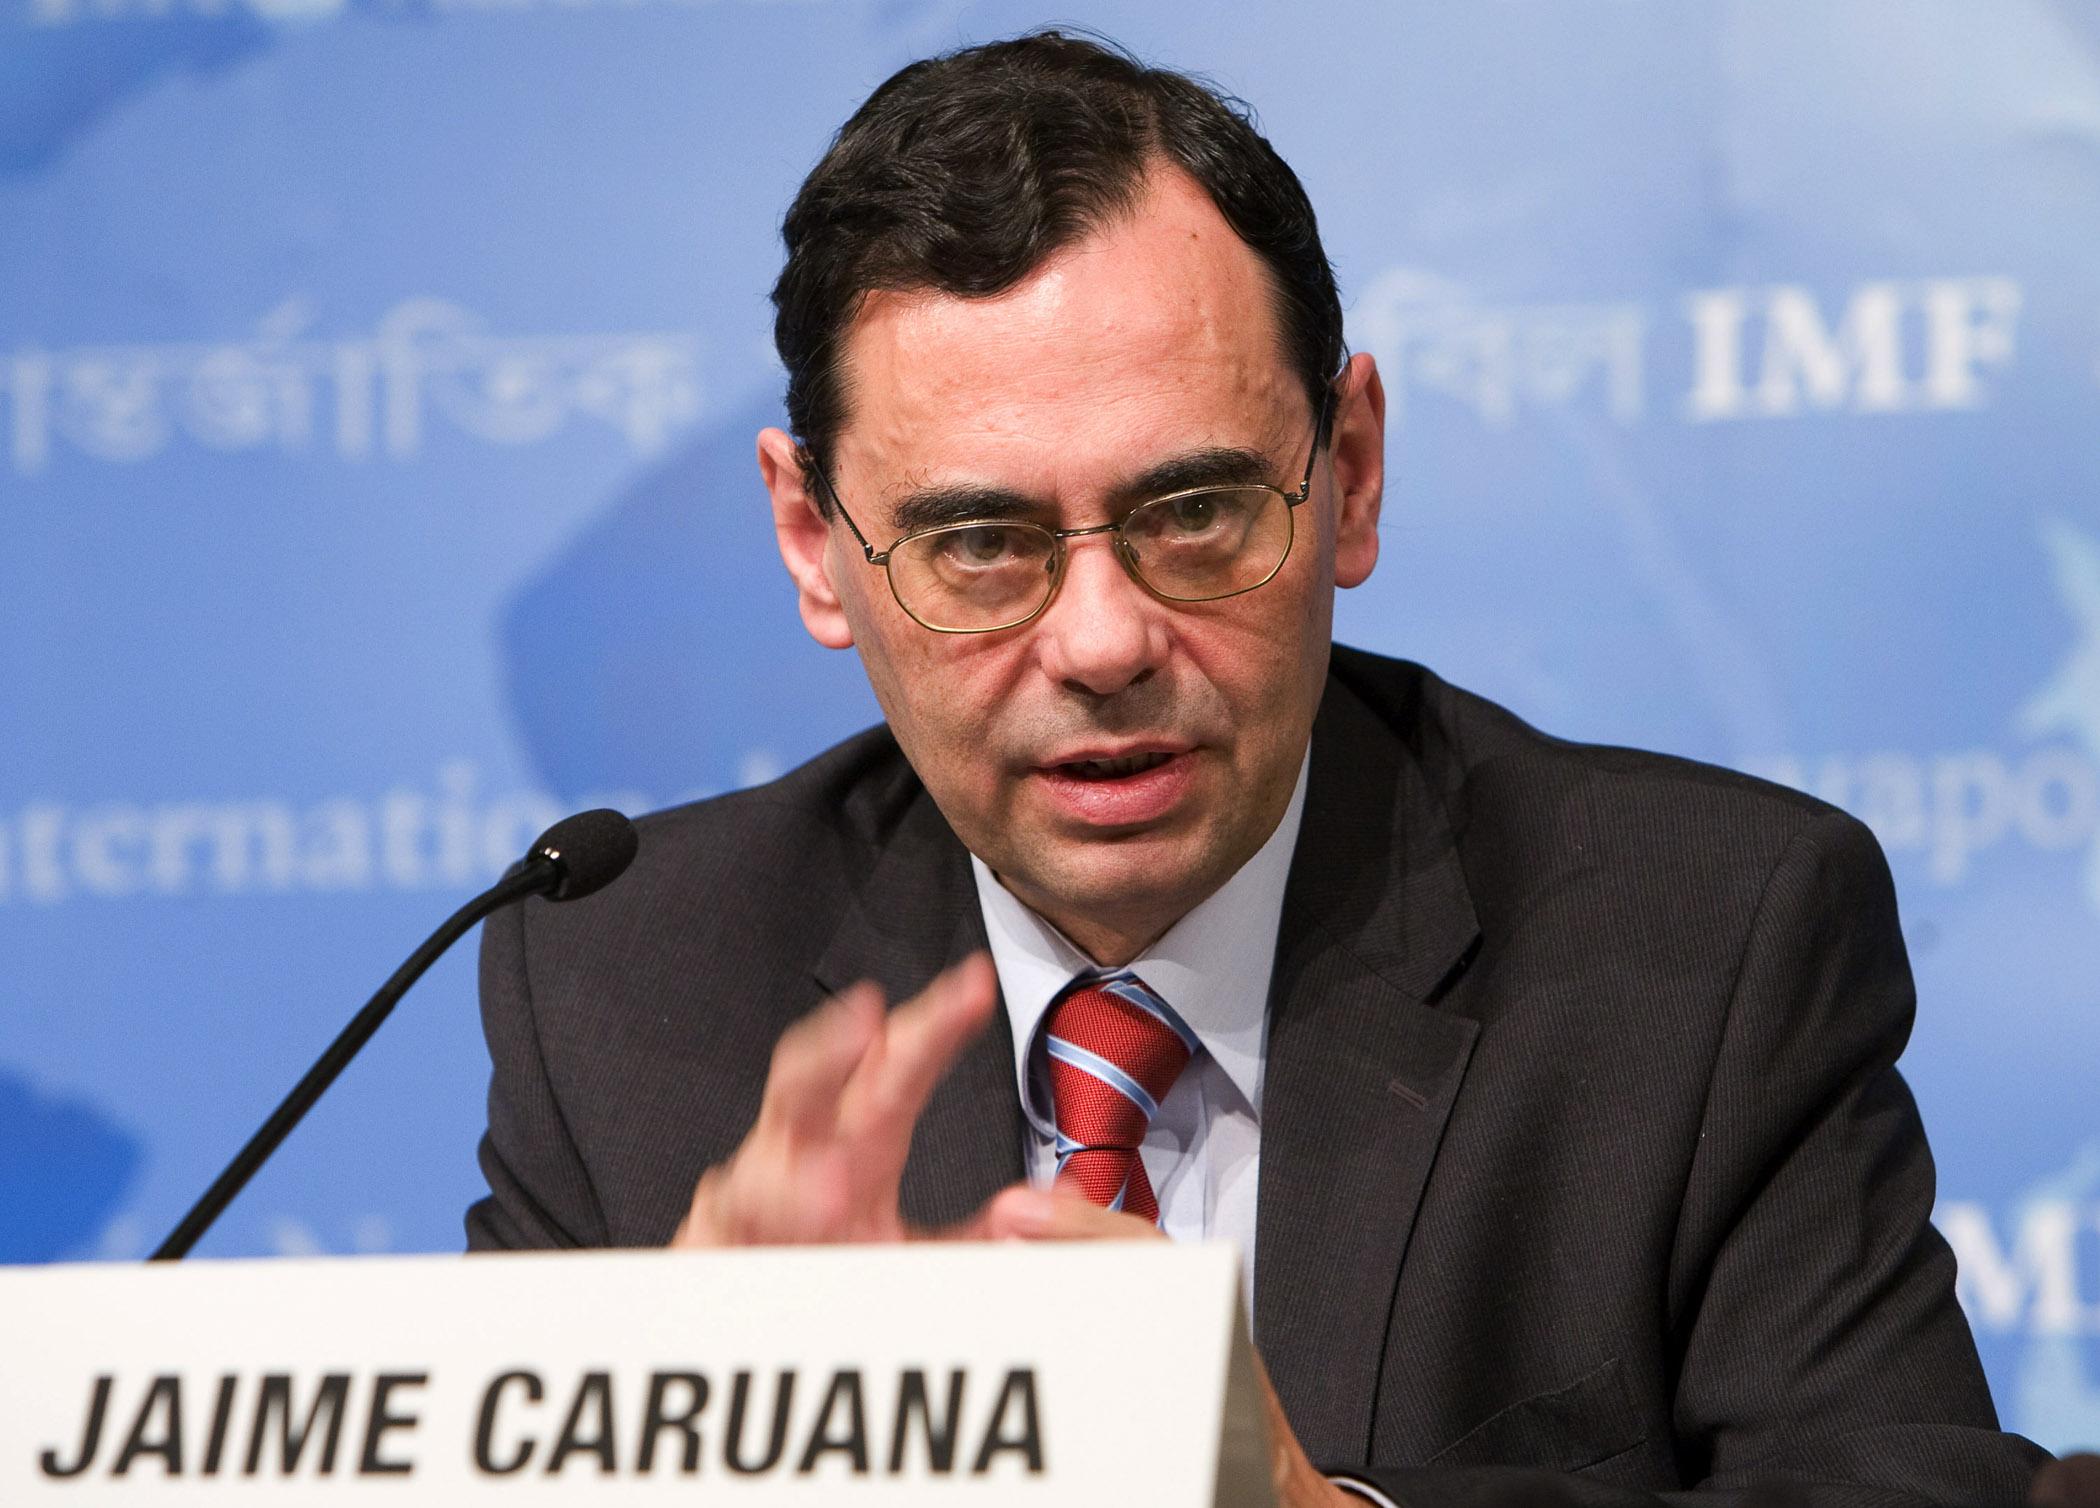 Jaime Caruana Net Worth